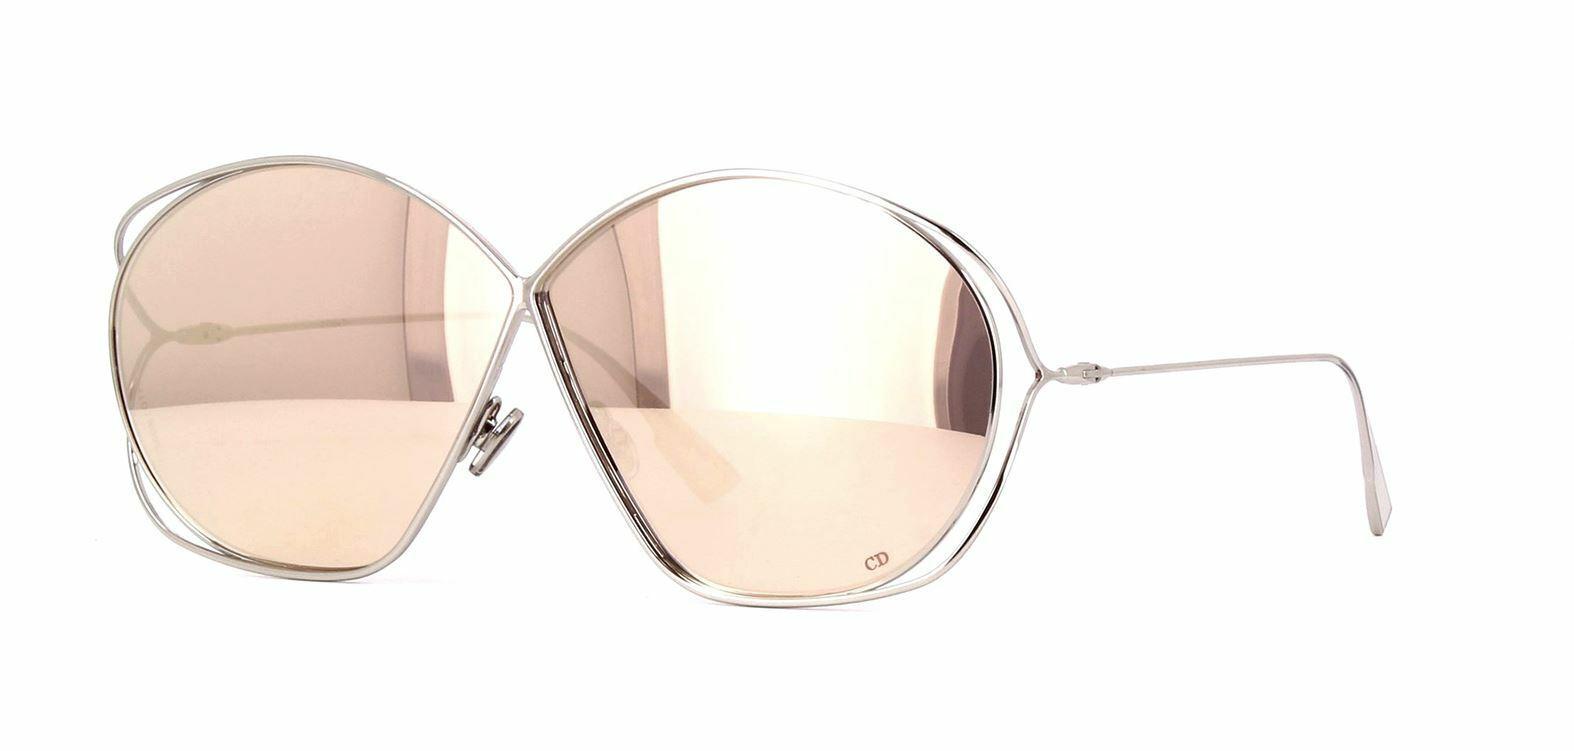 *NEW AUTHENTIC* DIOR STELLAIRE 02 10 PALLADIUM FRAME, Brown/Gold Mirror lens